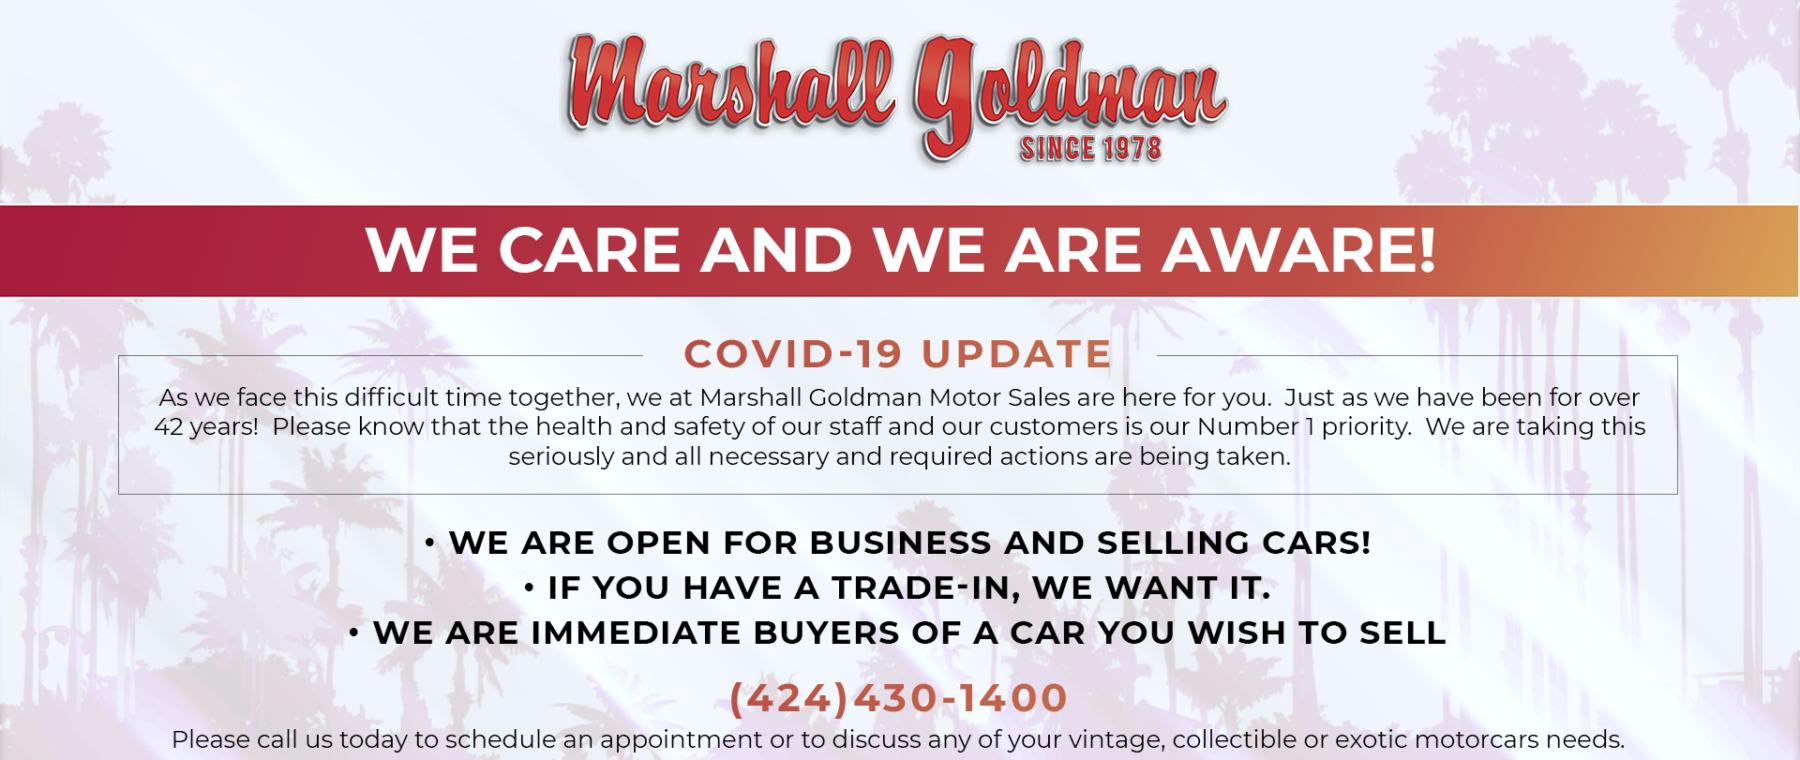 COVID-19 Update at Marshall Goldman Beverly Hills